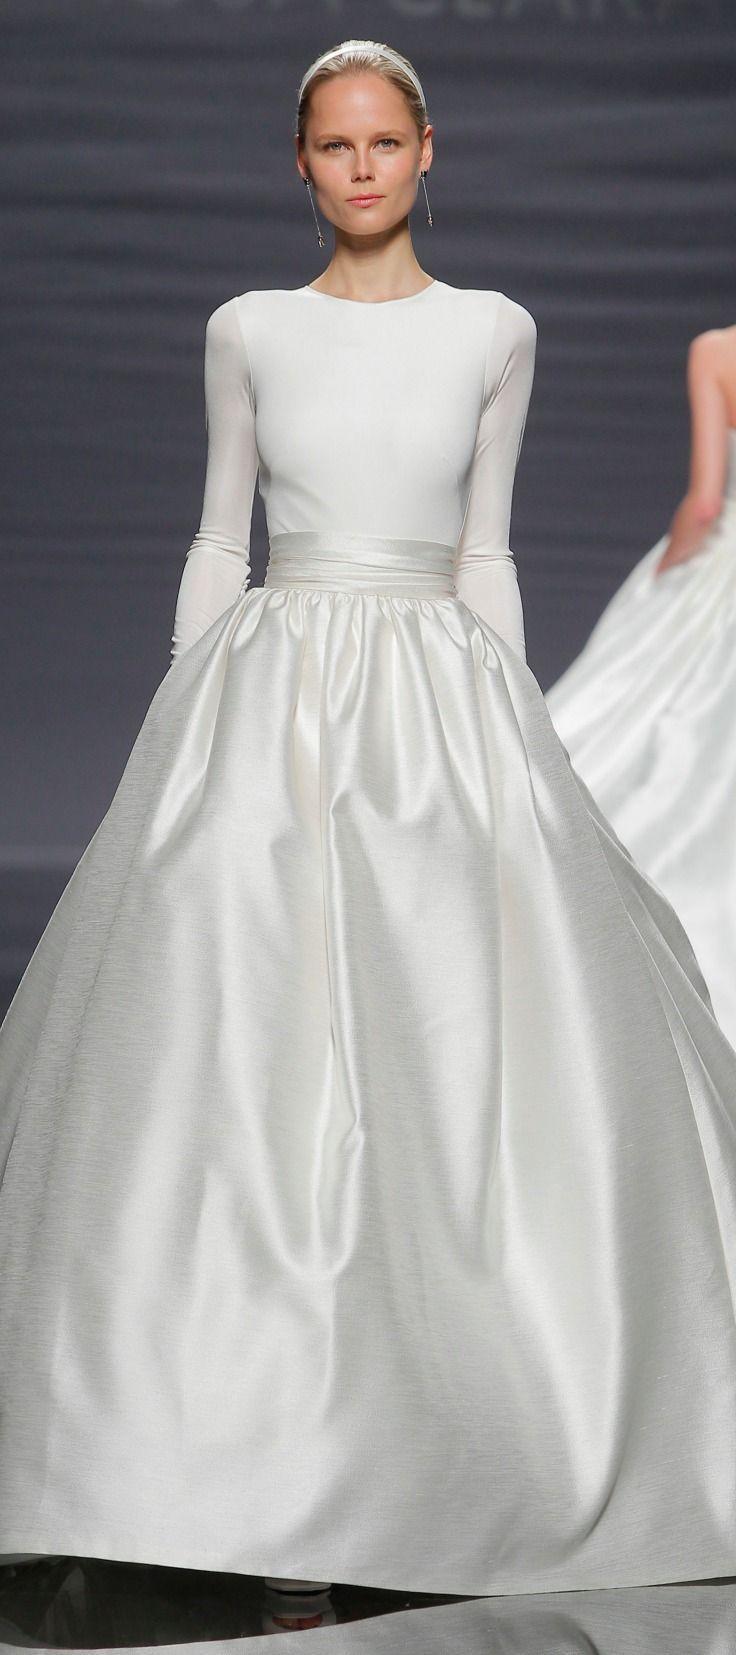 rosa clara wedding dress prices | Rosa Clara 2014 | Wedding Dresses ...